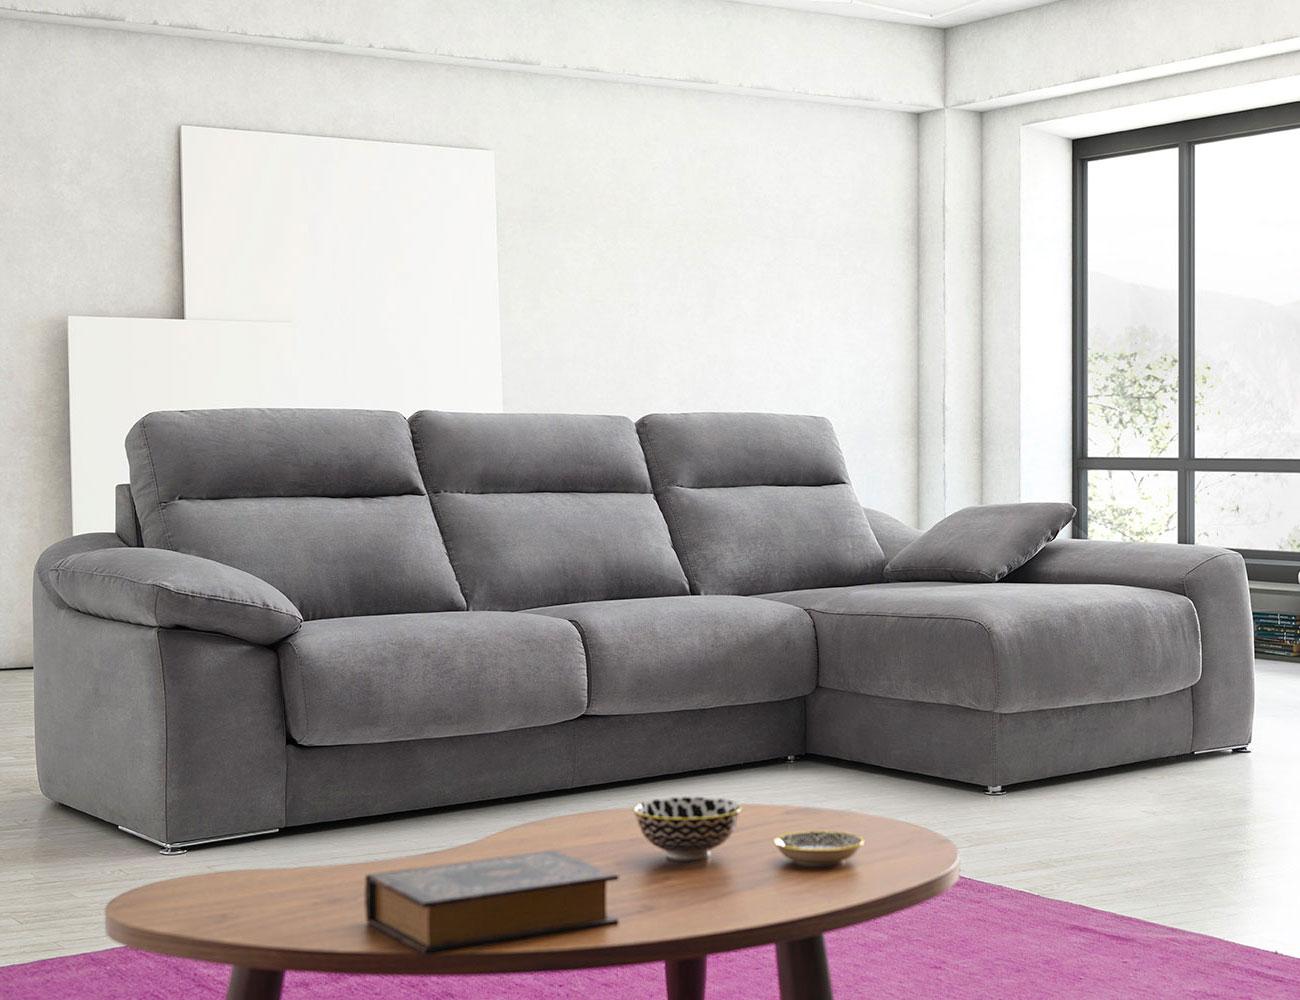 Sofa chaiselongue asientos viscolastica pedro ortiz1